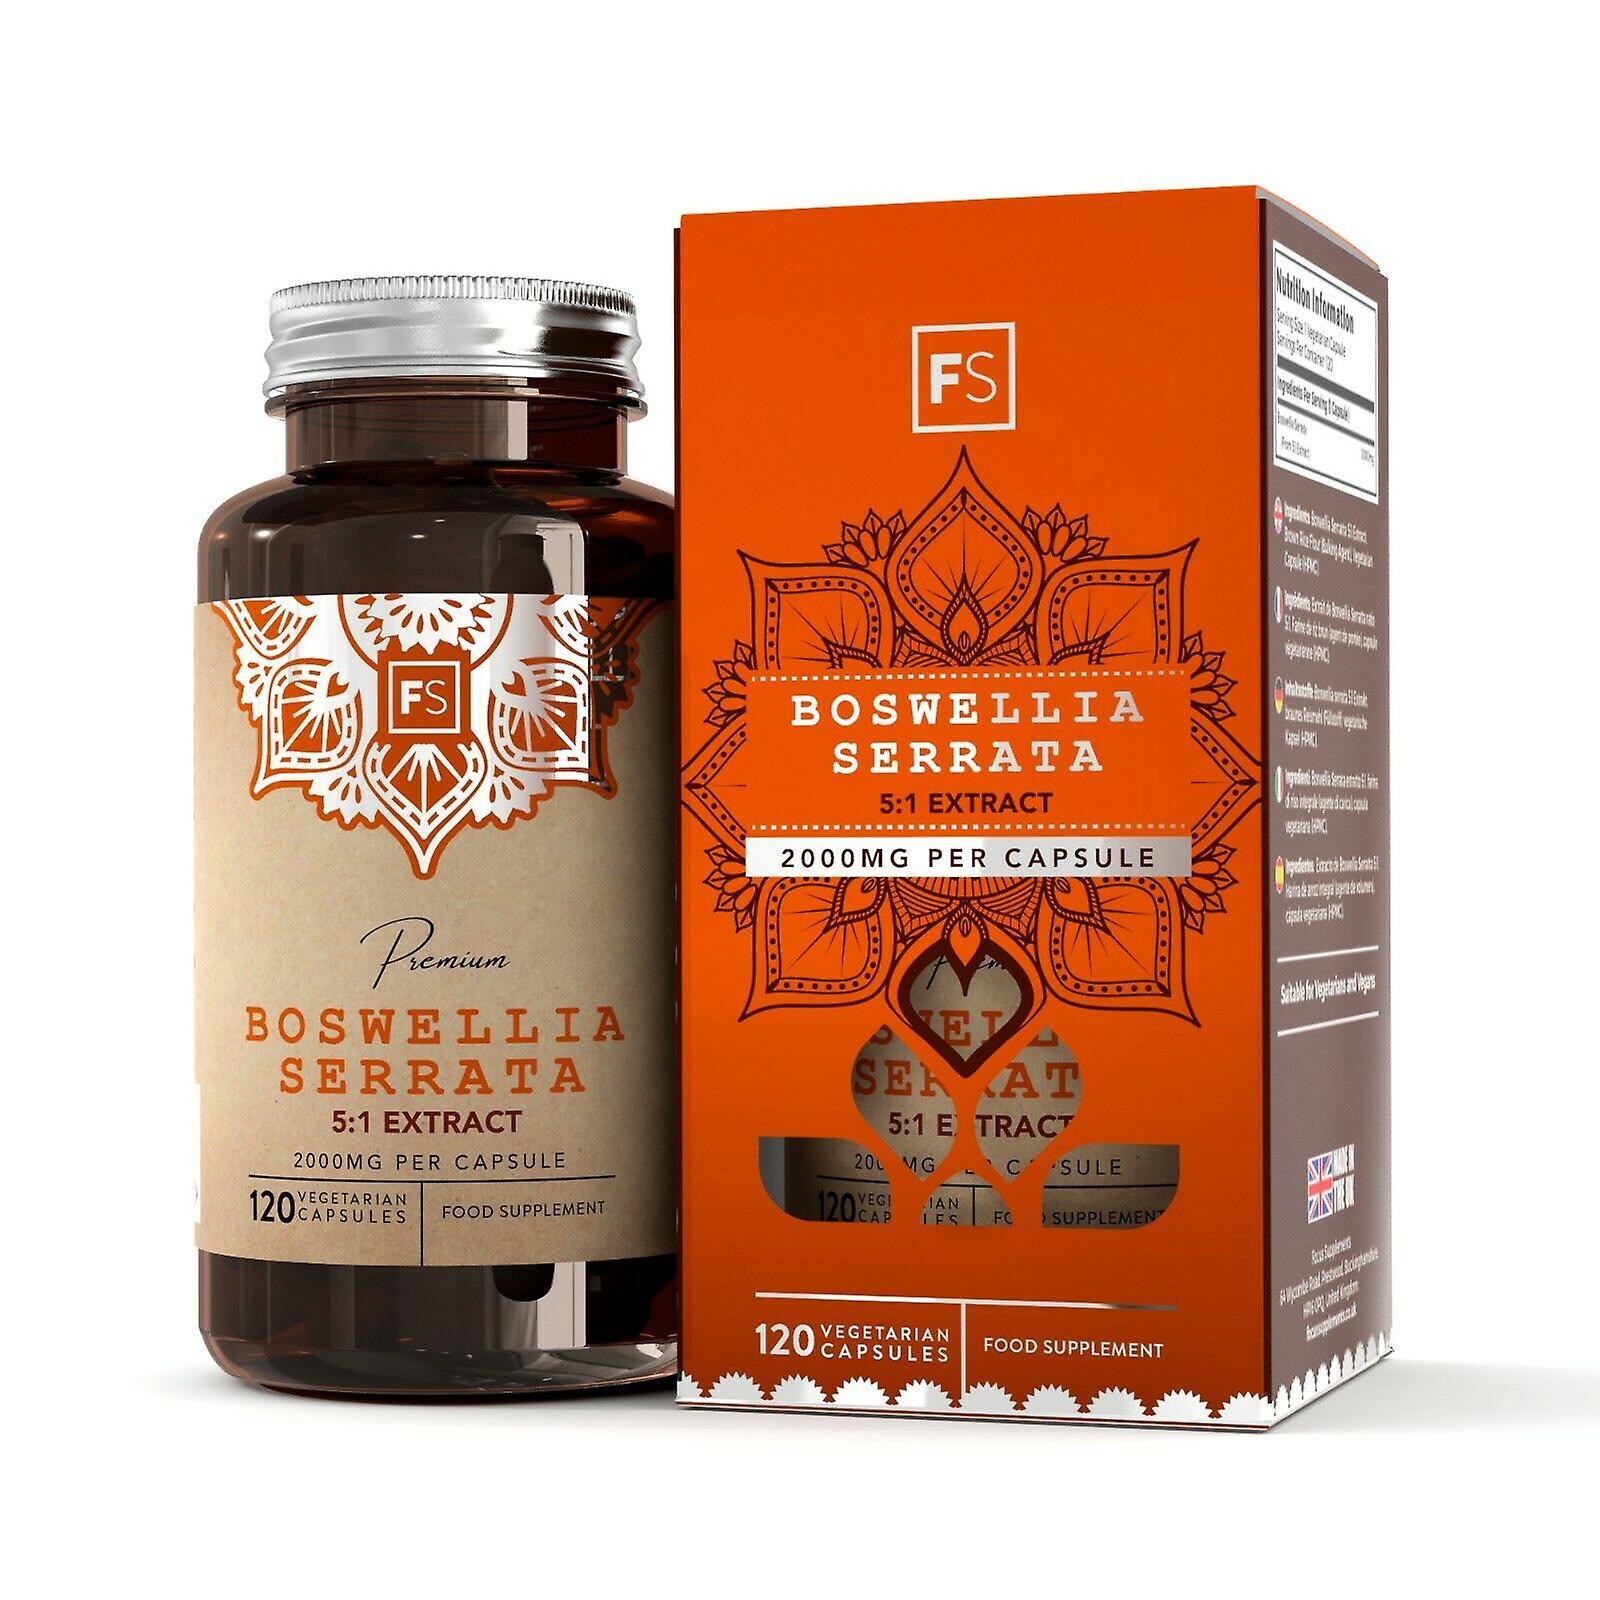 Focus Supplements Boswellia Serrata 5:1 Extract (2000mg) Capsules